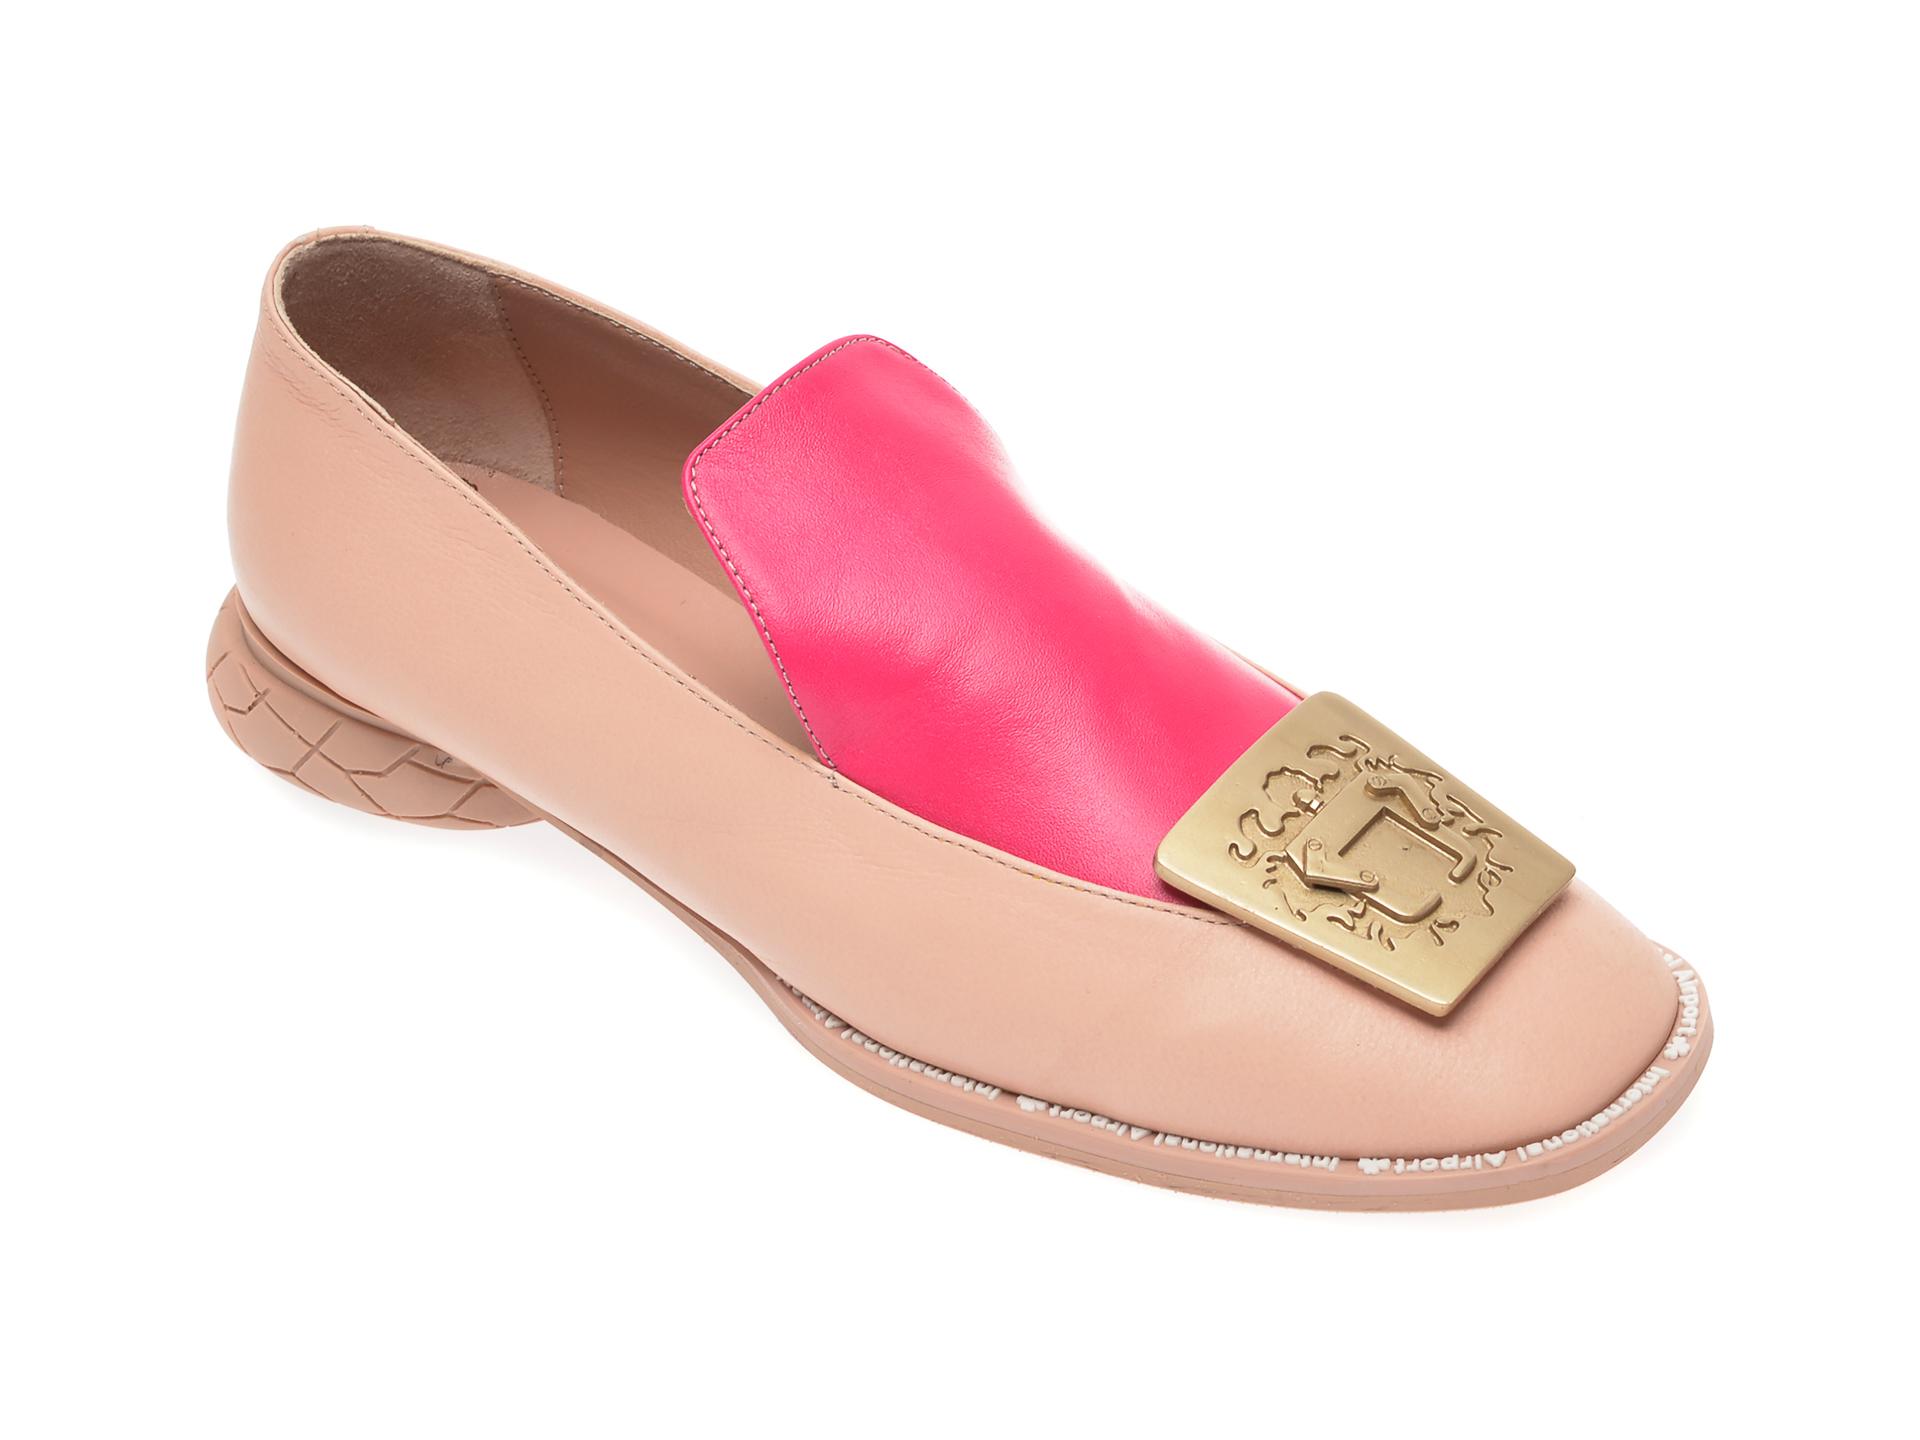 Pantofi FLAVIA PASSINI roz, GM4516, din piele naturala